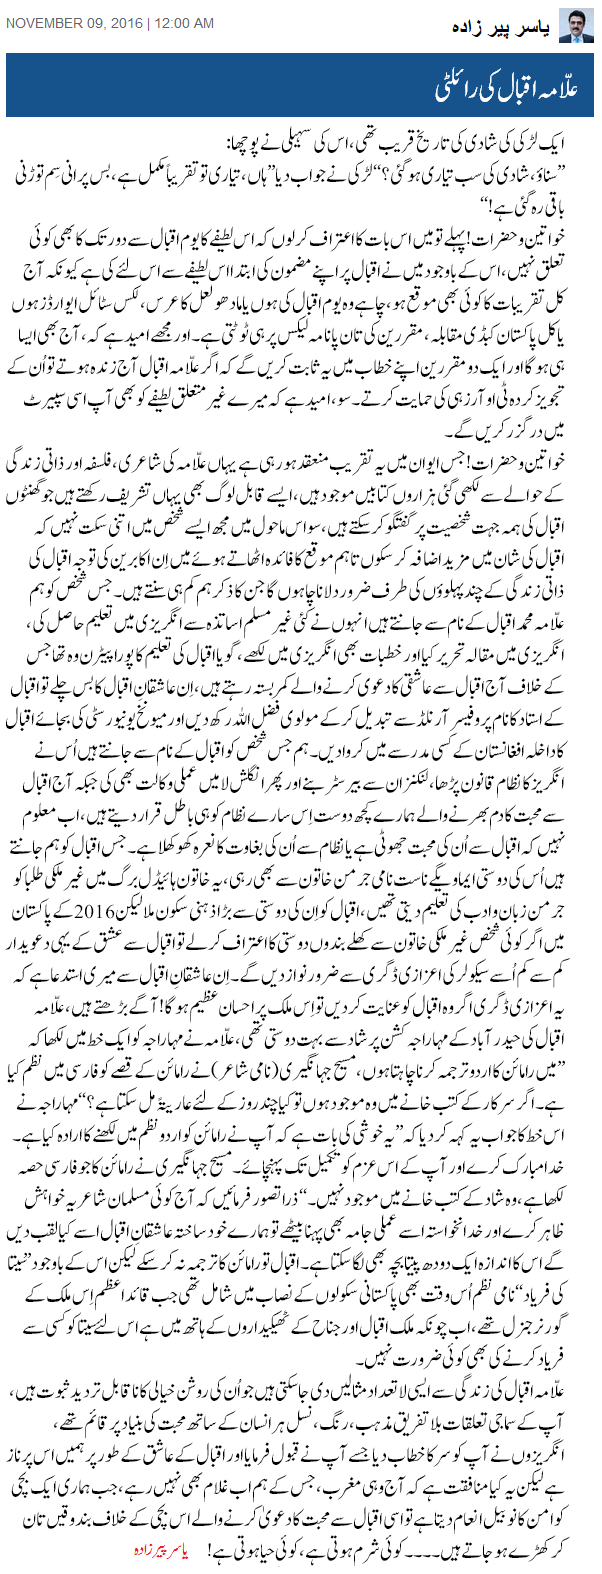 https://jang.com.pk/print/211540-yasir-pirzada-column-2016-11-09-allama-iqbal-ki-royalty